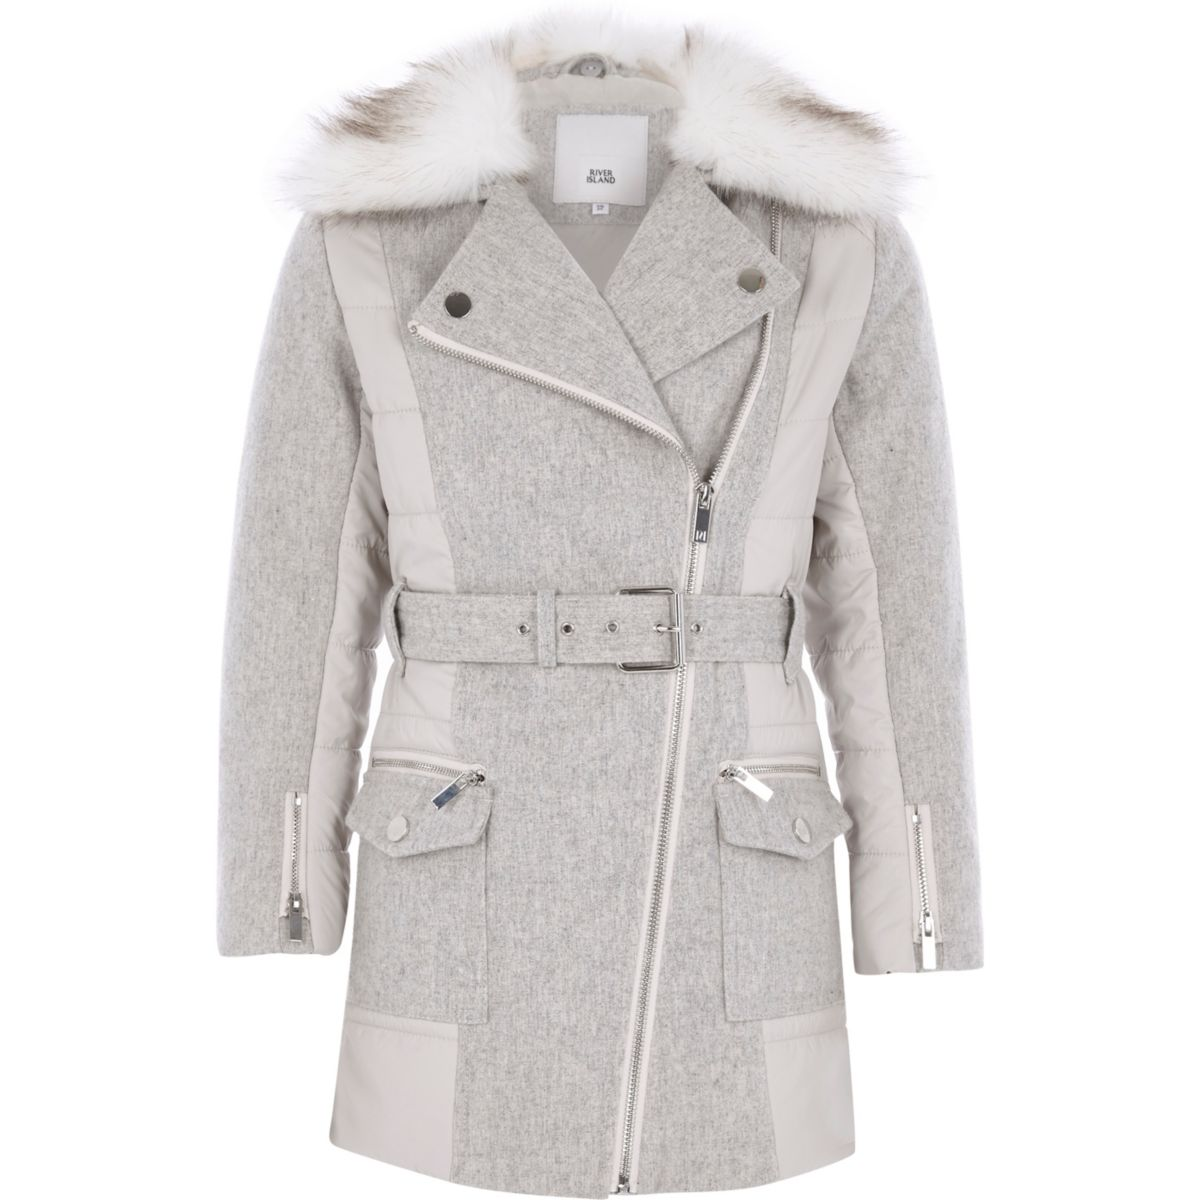 Girls grey belted faux fur trim coat